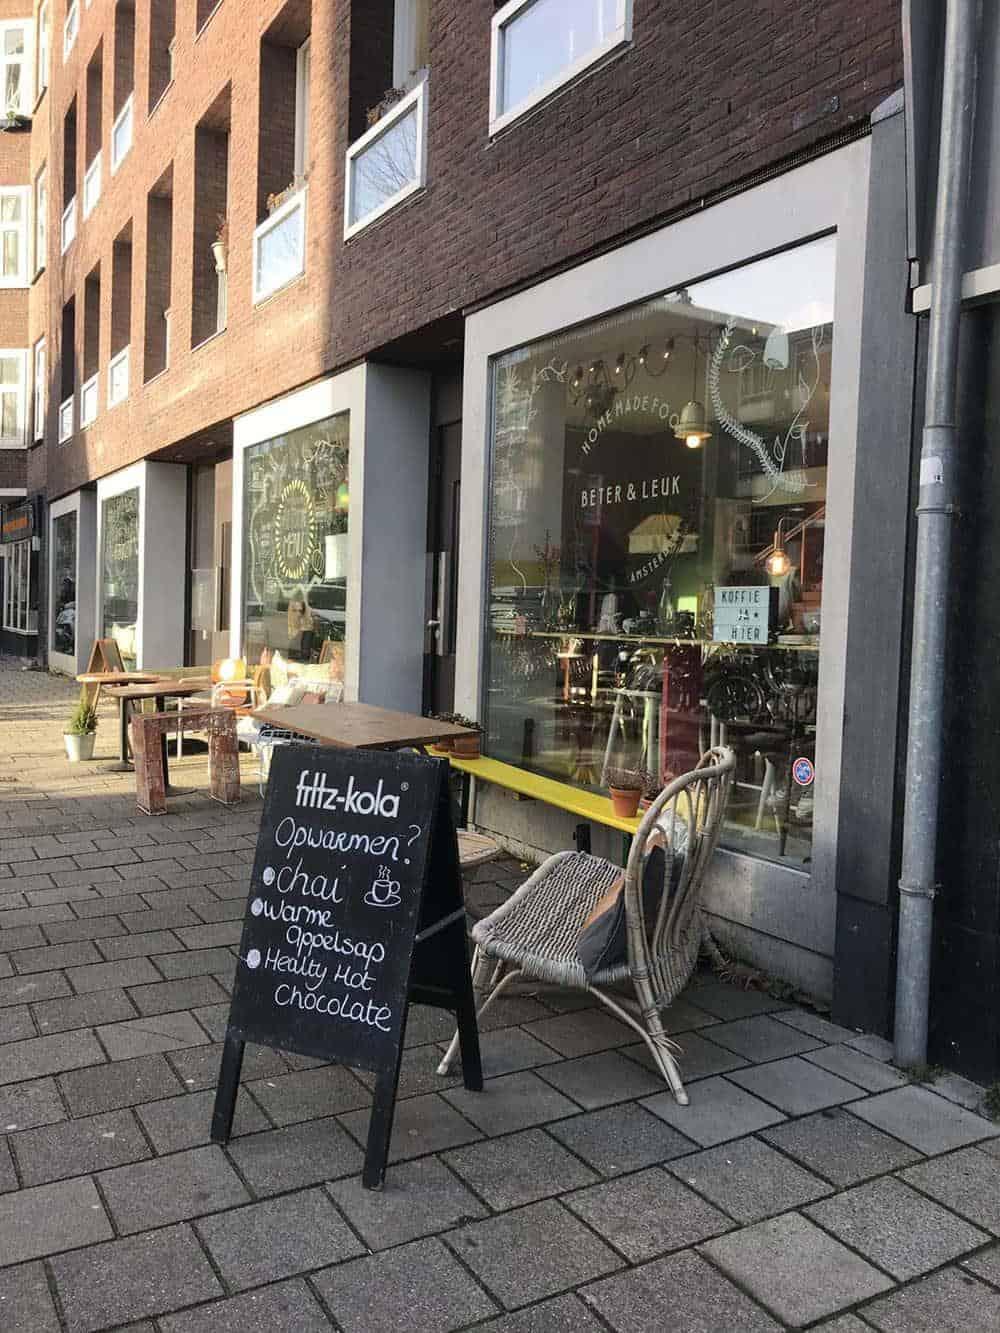 Beter & Leuk, Amsterdam